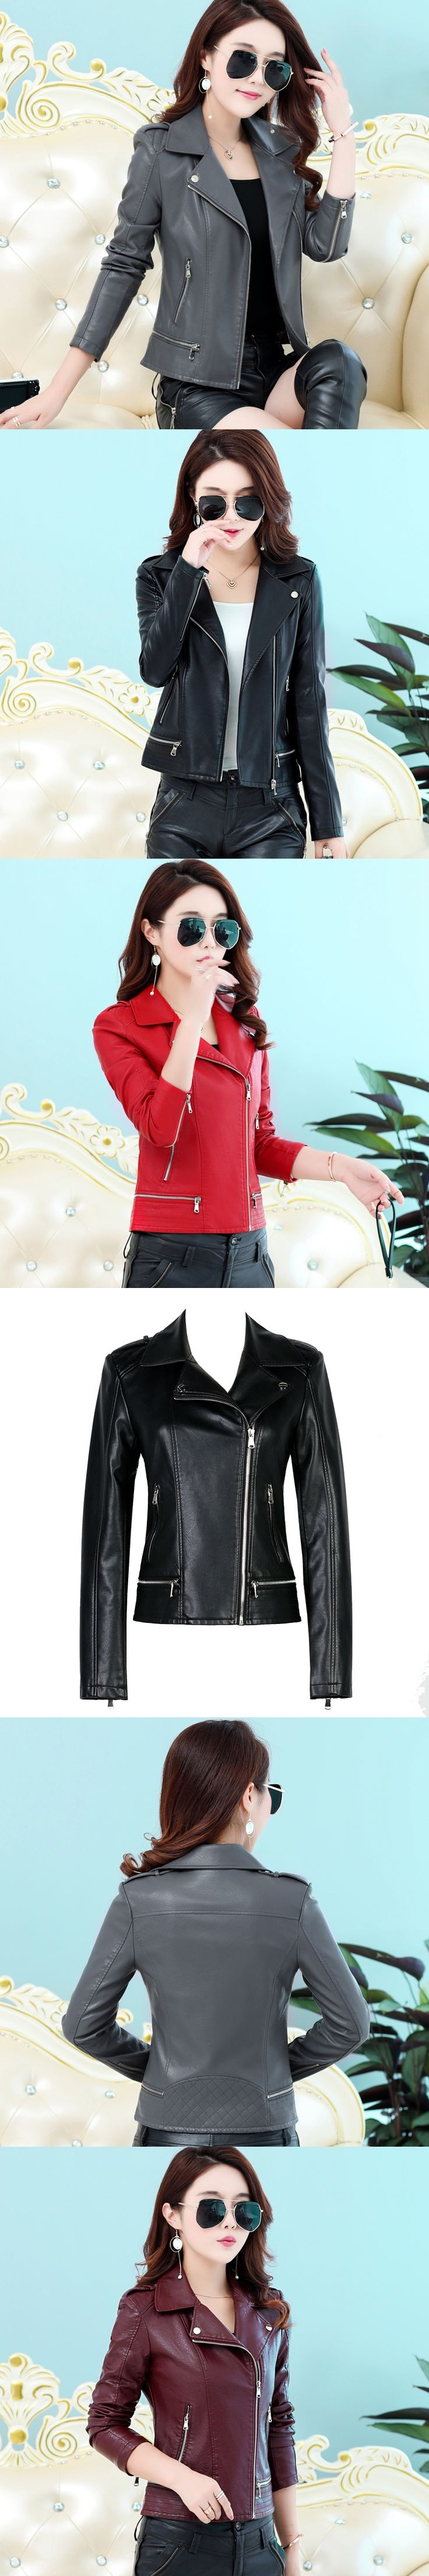 Women leather Jackets 2017 New Ladies Black Faux Leather Jackets Short Slim Motorcycle Zipper Coat Female Outerwear Clothing